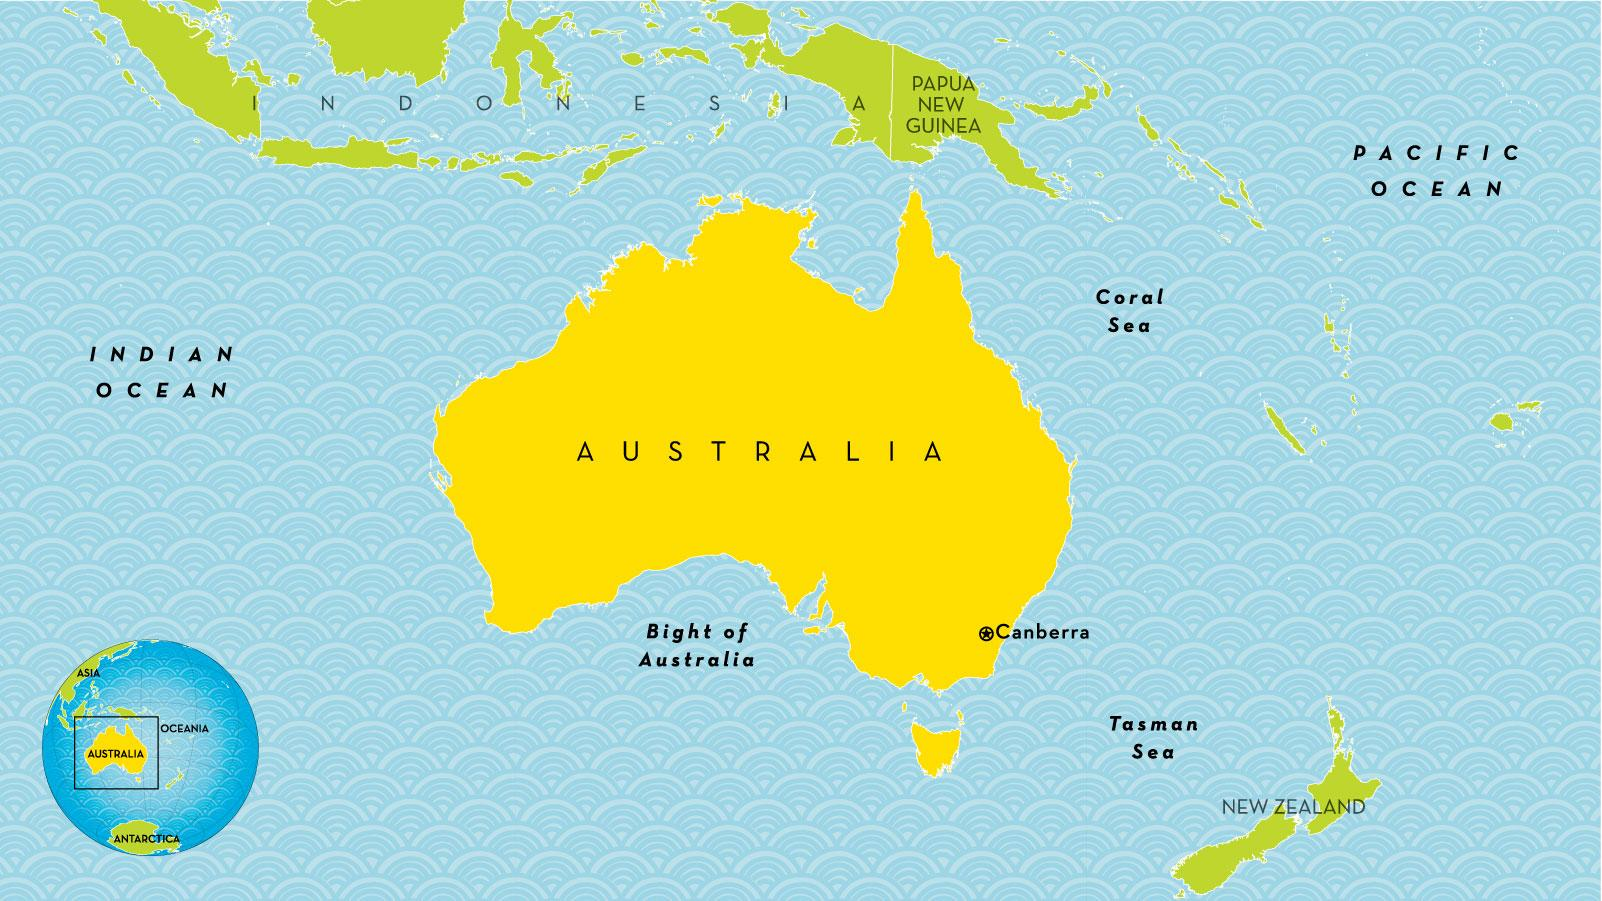 Australia Country Map.Australia Country Map Country Map Of Australia Australia